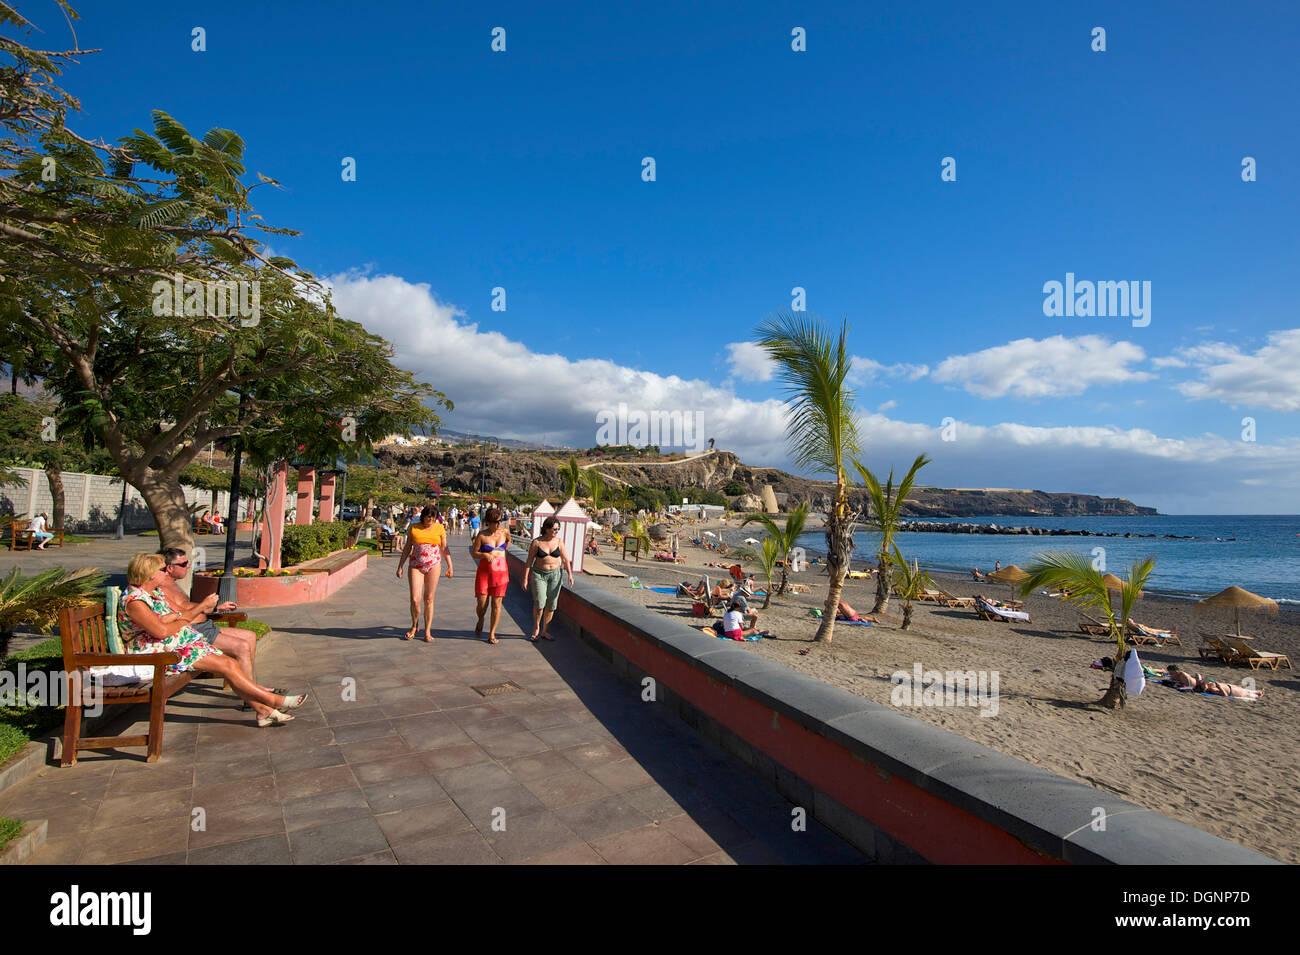 Beach, promenade of San Juan, Tenerife, Canary Islands, Spain, Europe - Stock Image